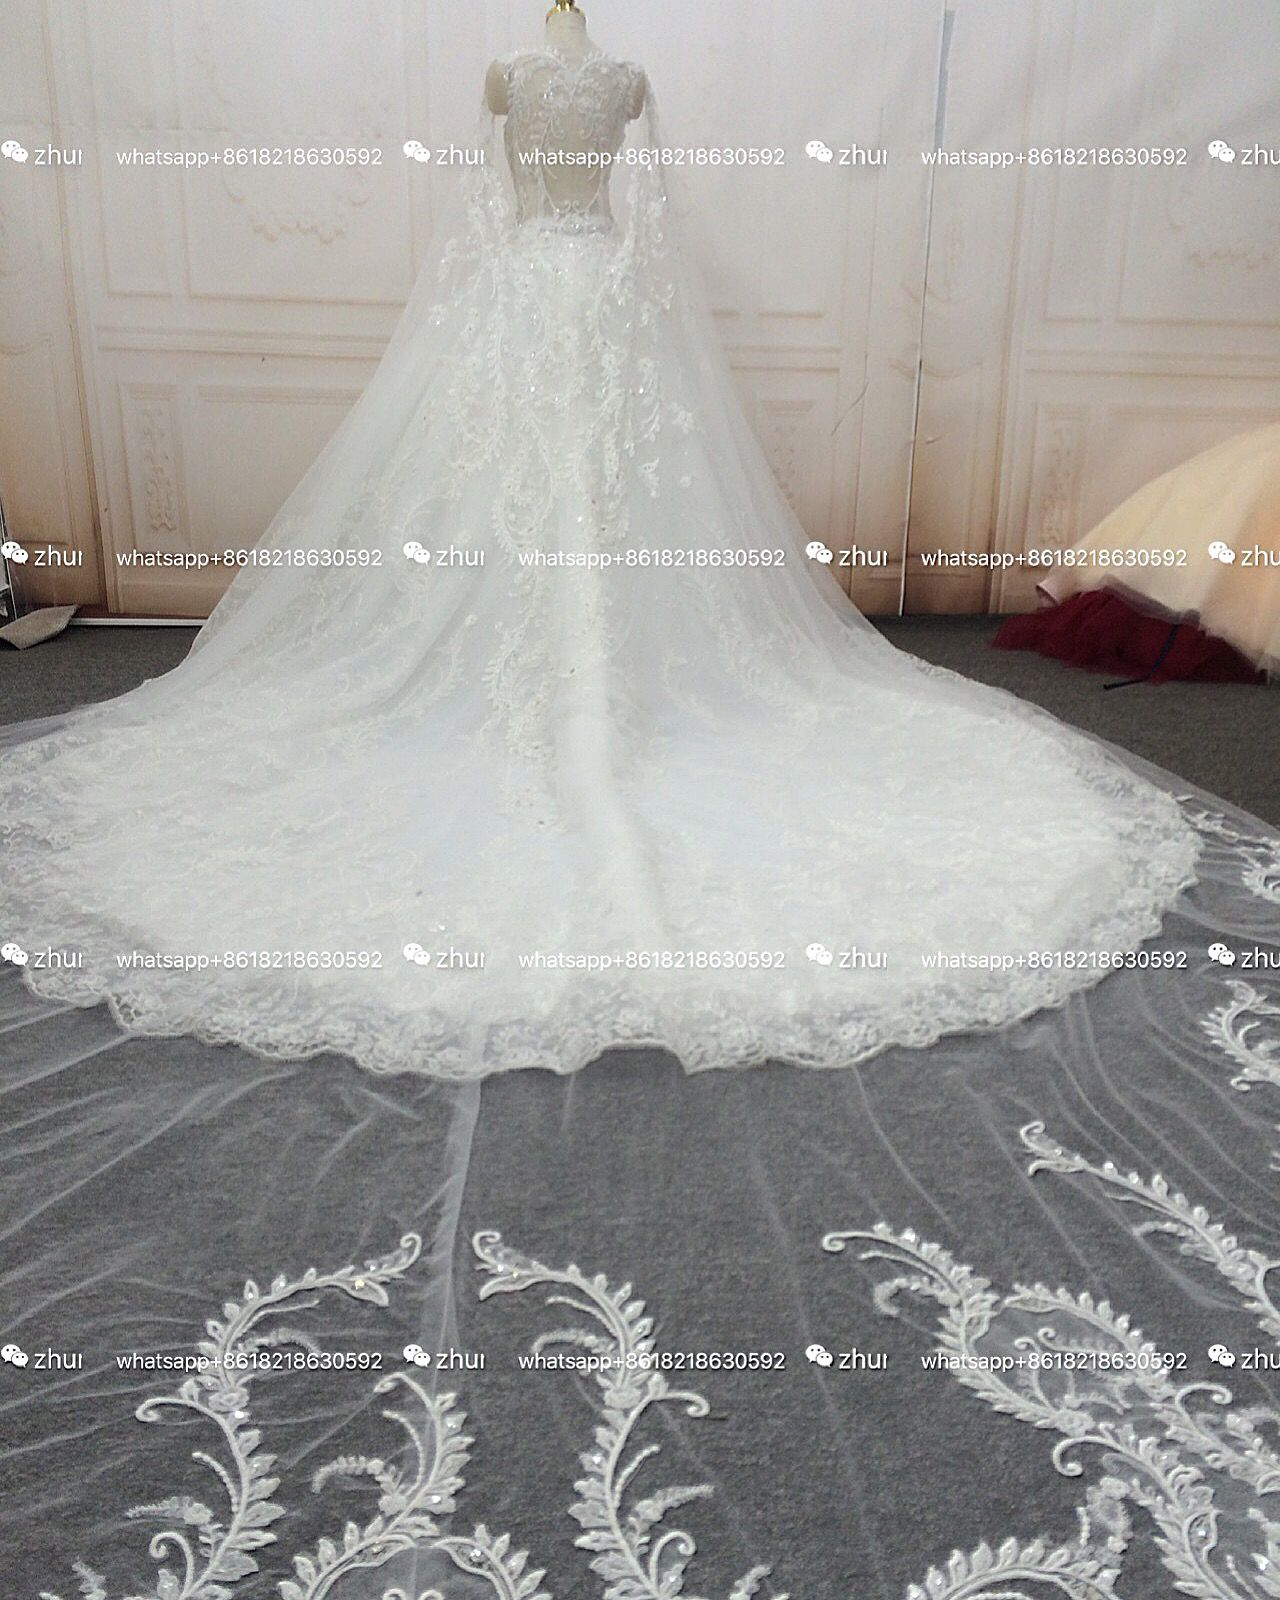 We sell, wholesale, custom, different styles of wedding dresses, skirts, flower girl dress. Welcome to choose#dress #weddingplanning #gorgeous #bridesmaid #bride#elegent  #hanutecouture #show  #wedding #weddingdress #beautifull #highfashion #bridalshower#design#ballgown #handwork #like4like #love #art #me  #amazing #bridetobe  #womenfashion #paris #photography #luxury #inspiration #dubai #paris #chill #ootd